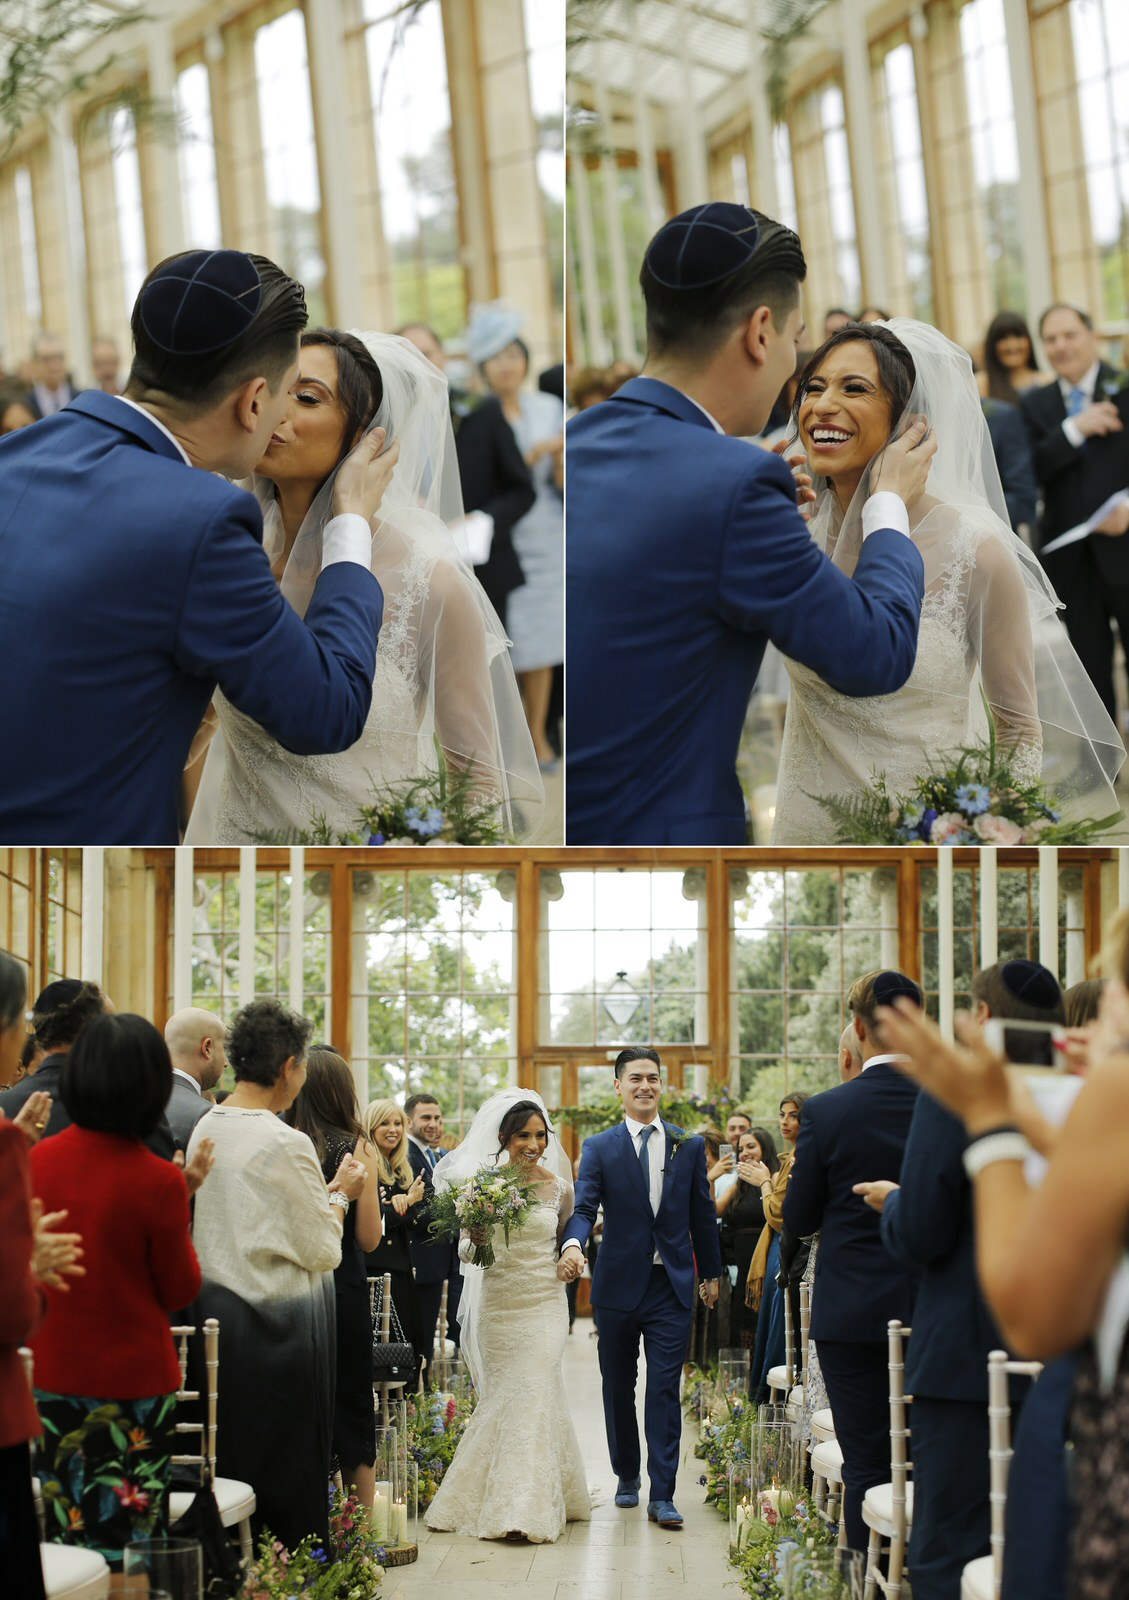 Brettharkness-kew-gardens-wedding_0017.jpg